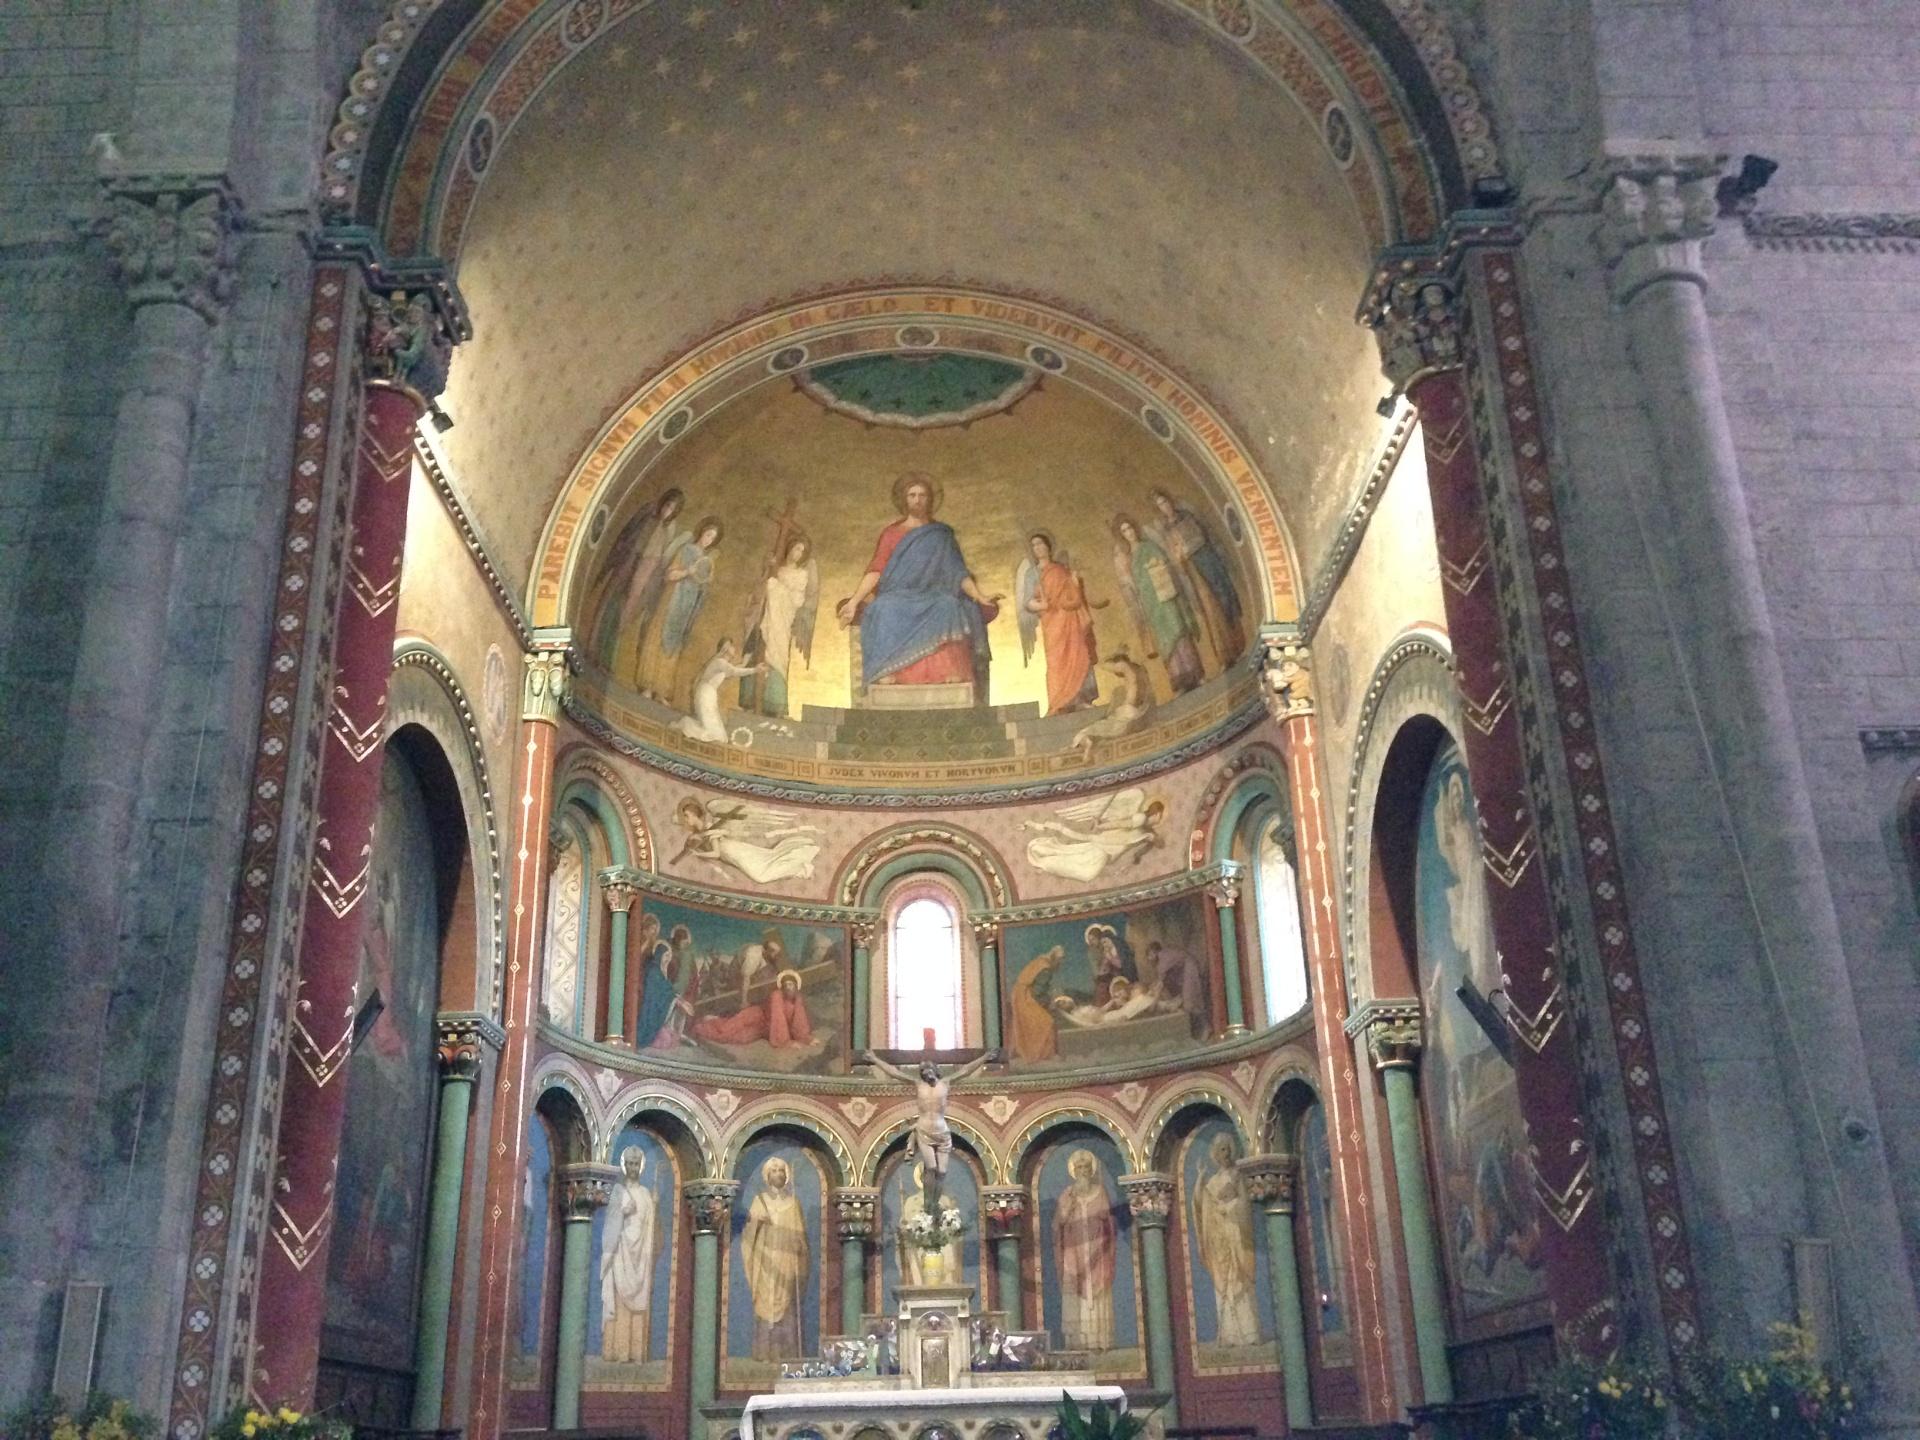 Eglise Sainte-Croix Oloron-Sainte-Marie